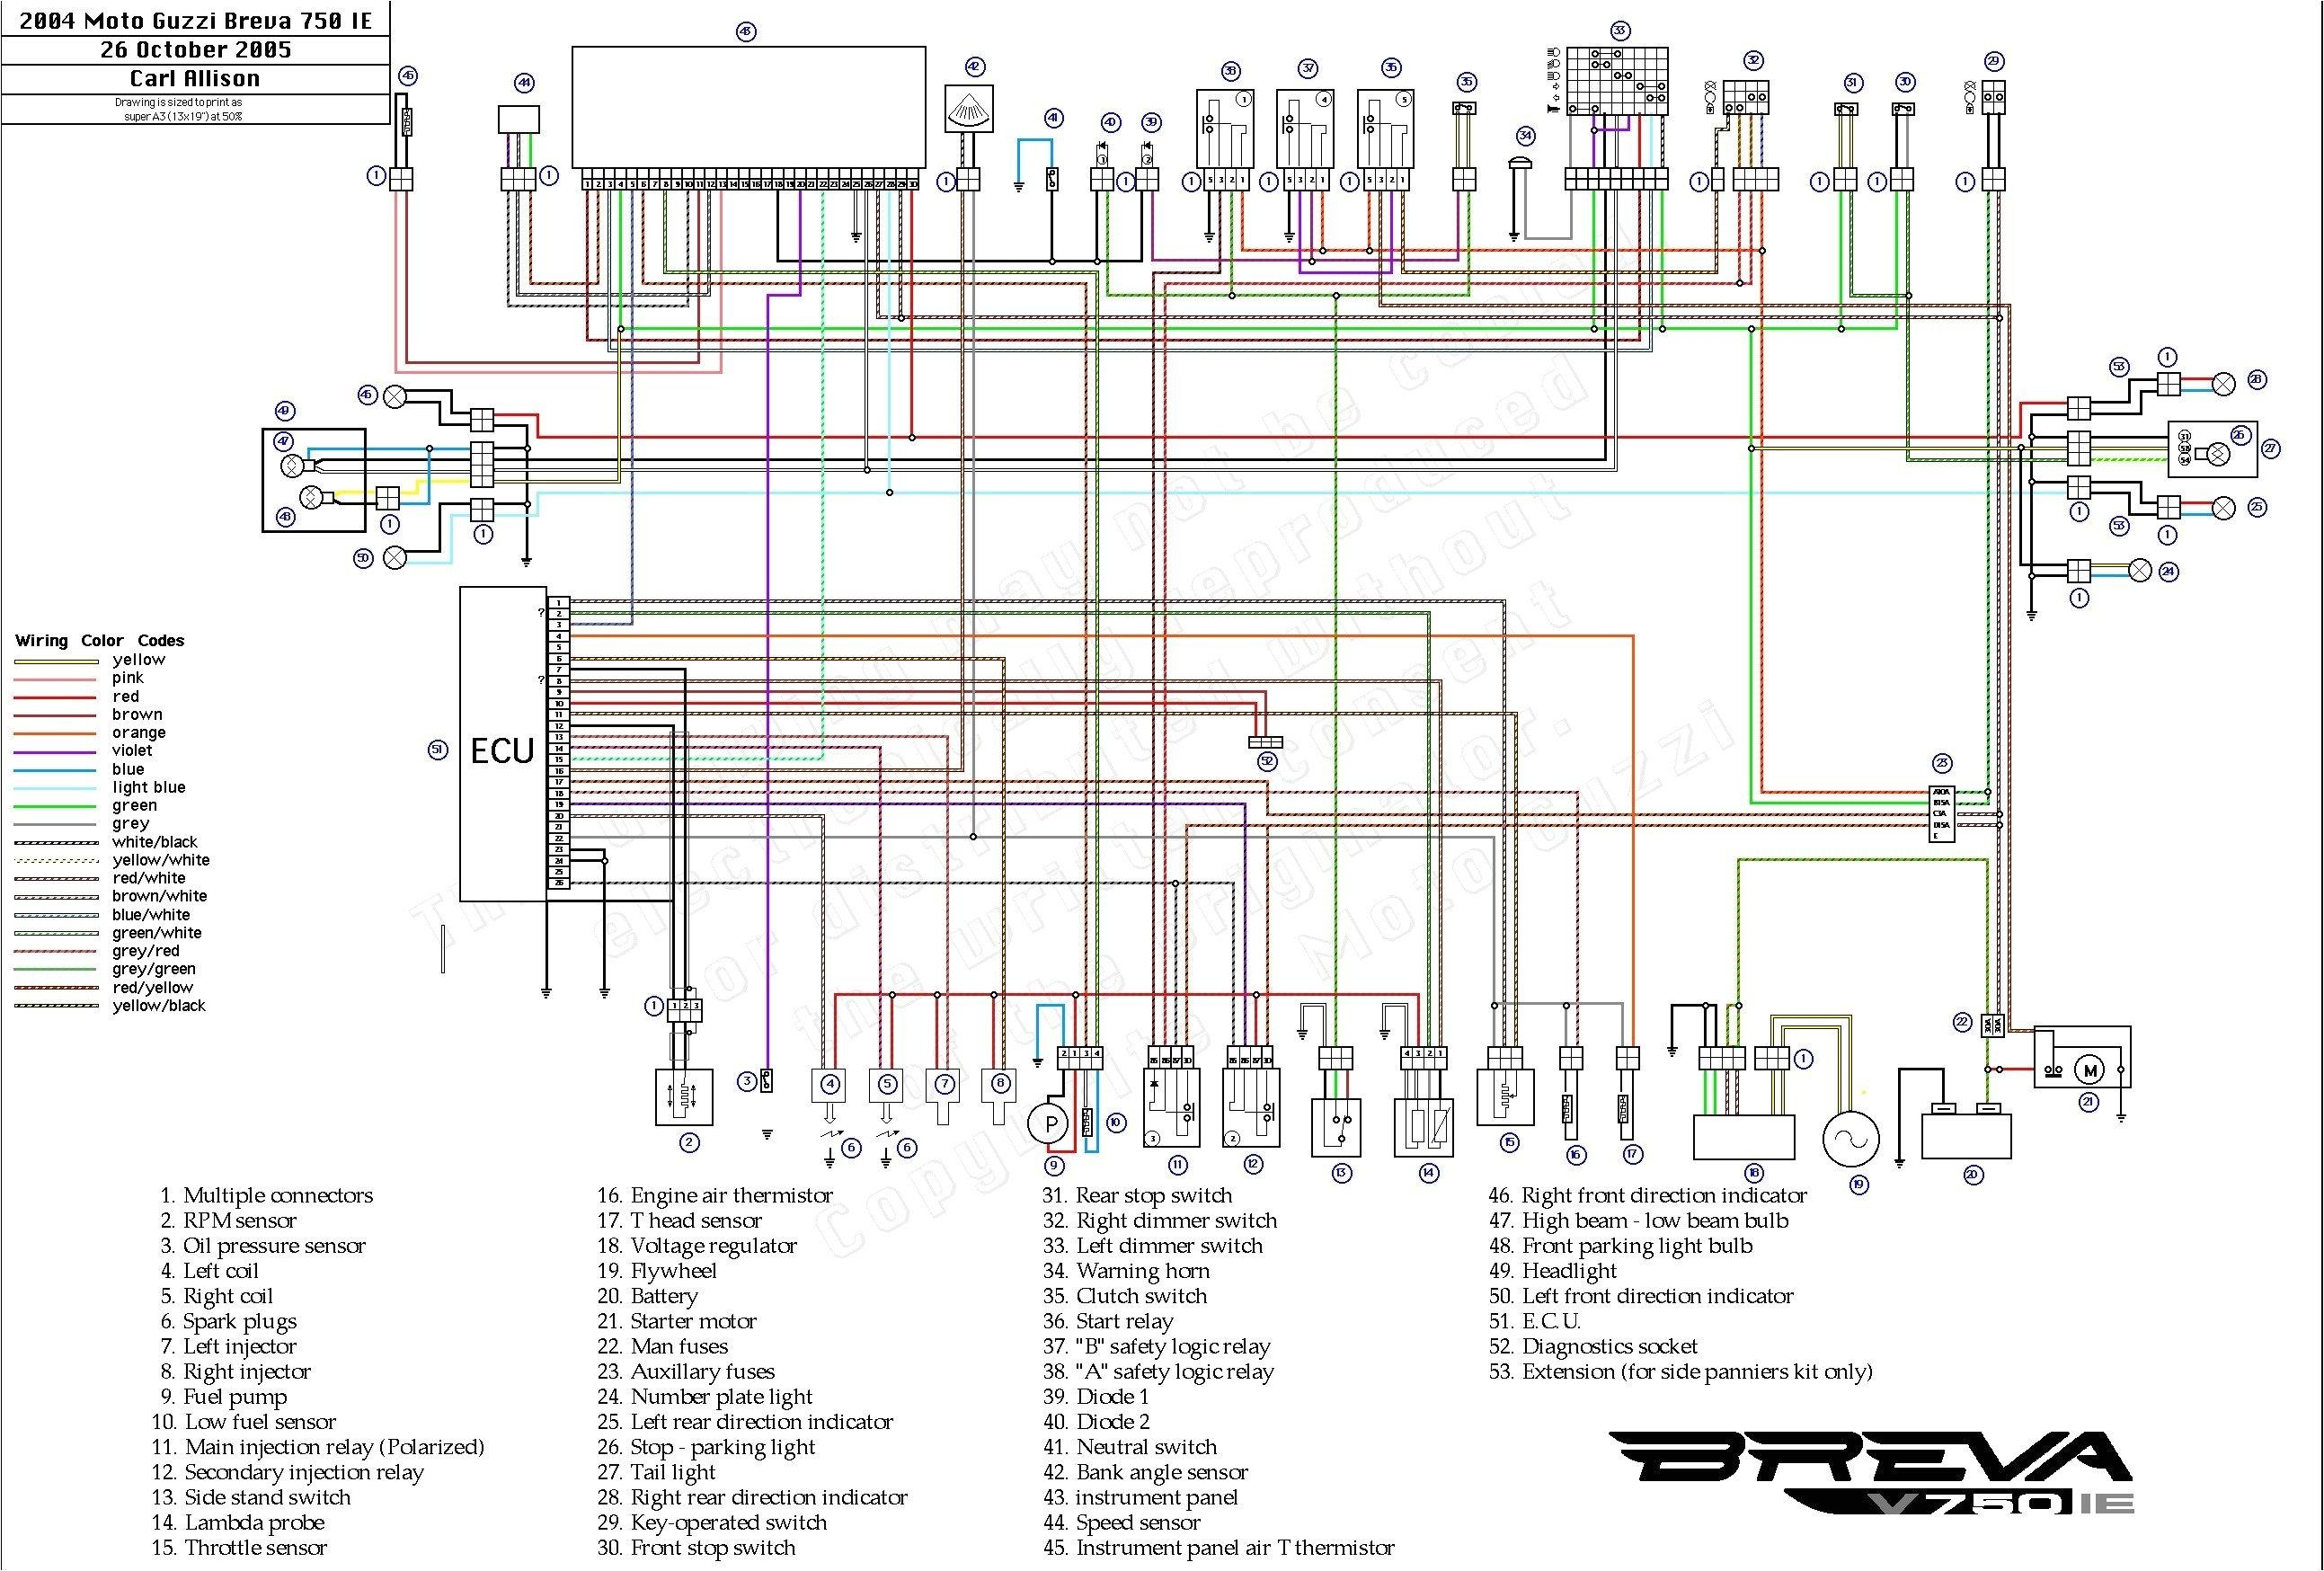 318 dodge engine system diagram wiring diagram expert dodge 318 engine manmbarnings diagram wiring diagram paper